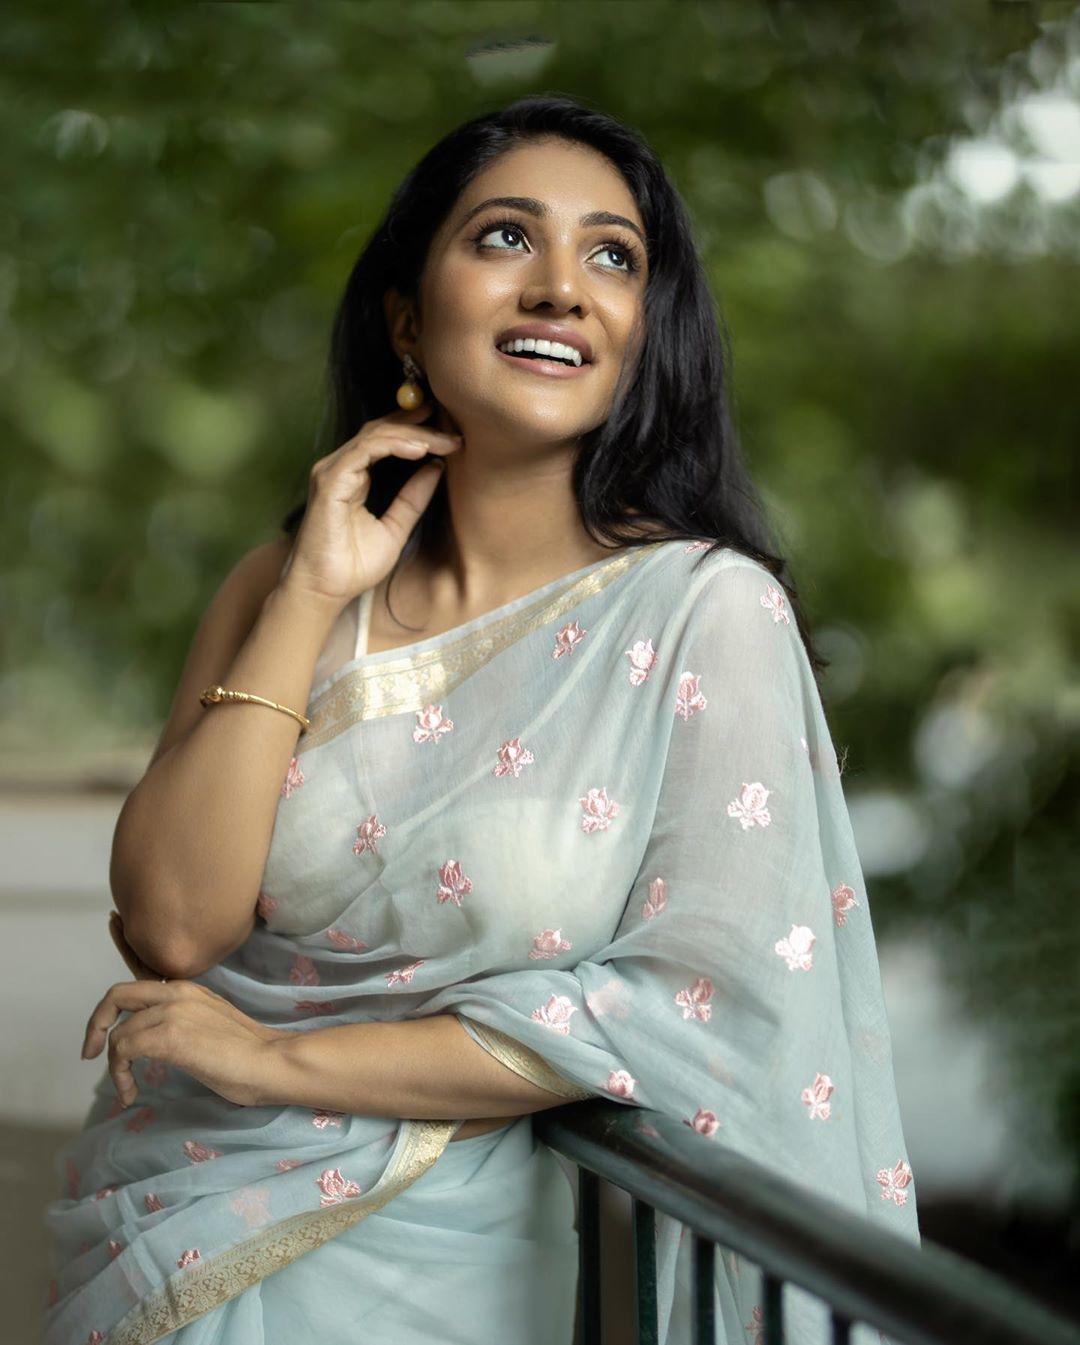 Bommu Lakshmi photos (60)